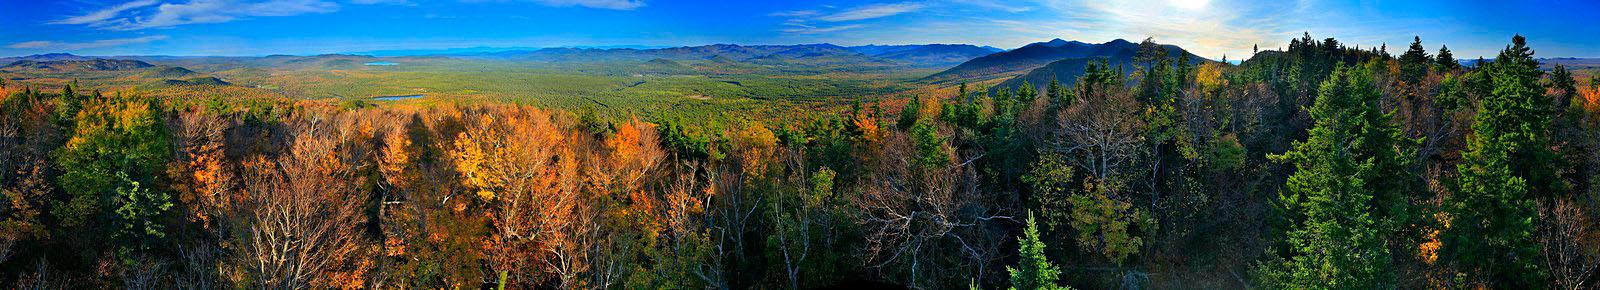 Wilmington Range,treetop,360,degree,panorama,Whiteface,Mt,Wilmington,town,Adirondacks, photo